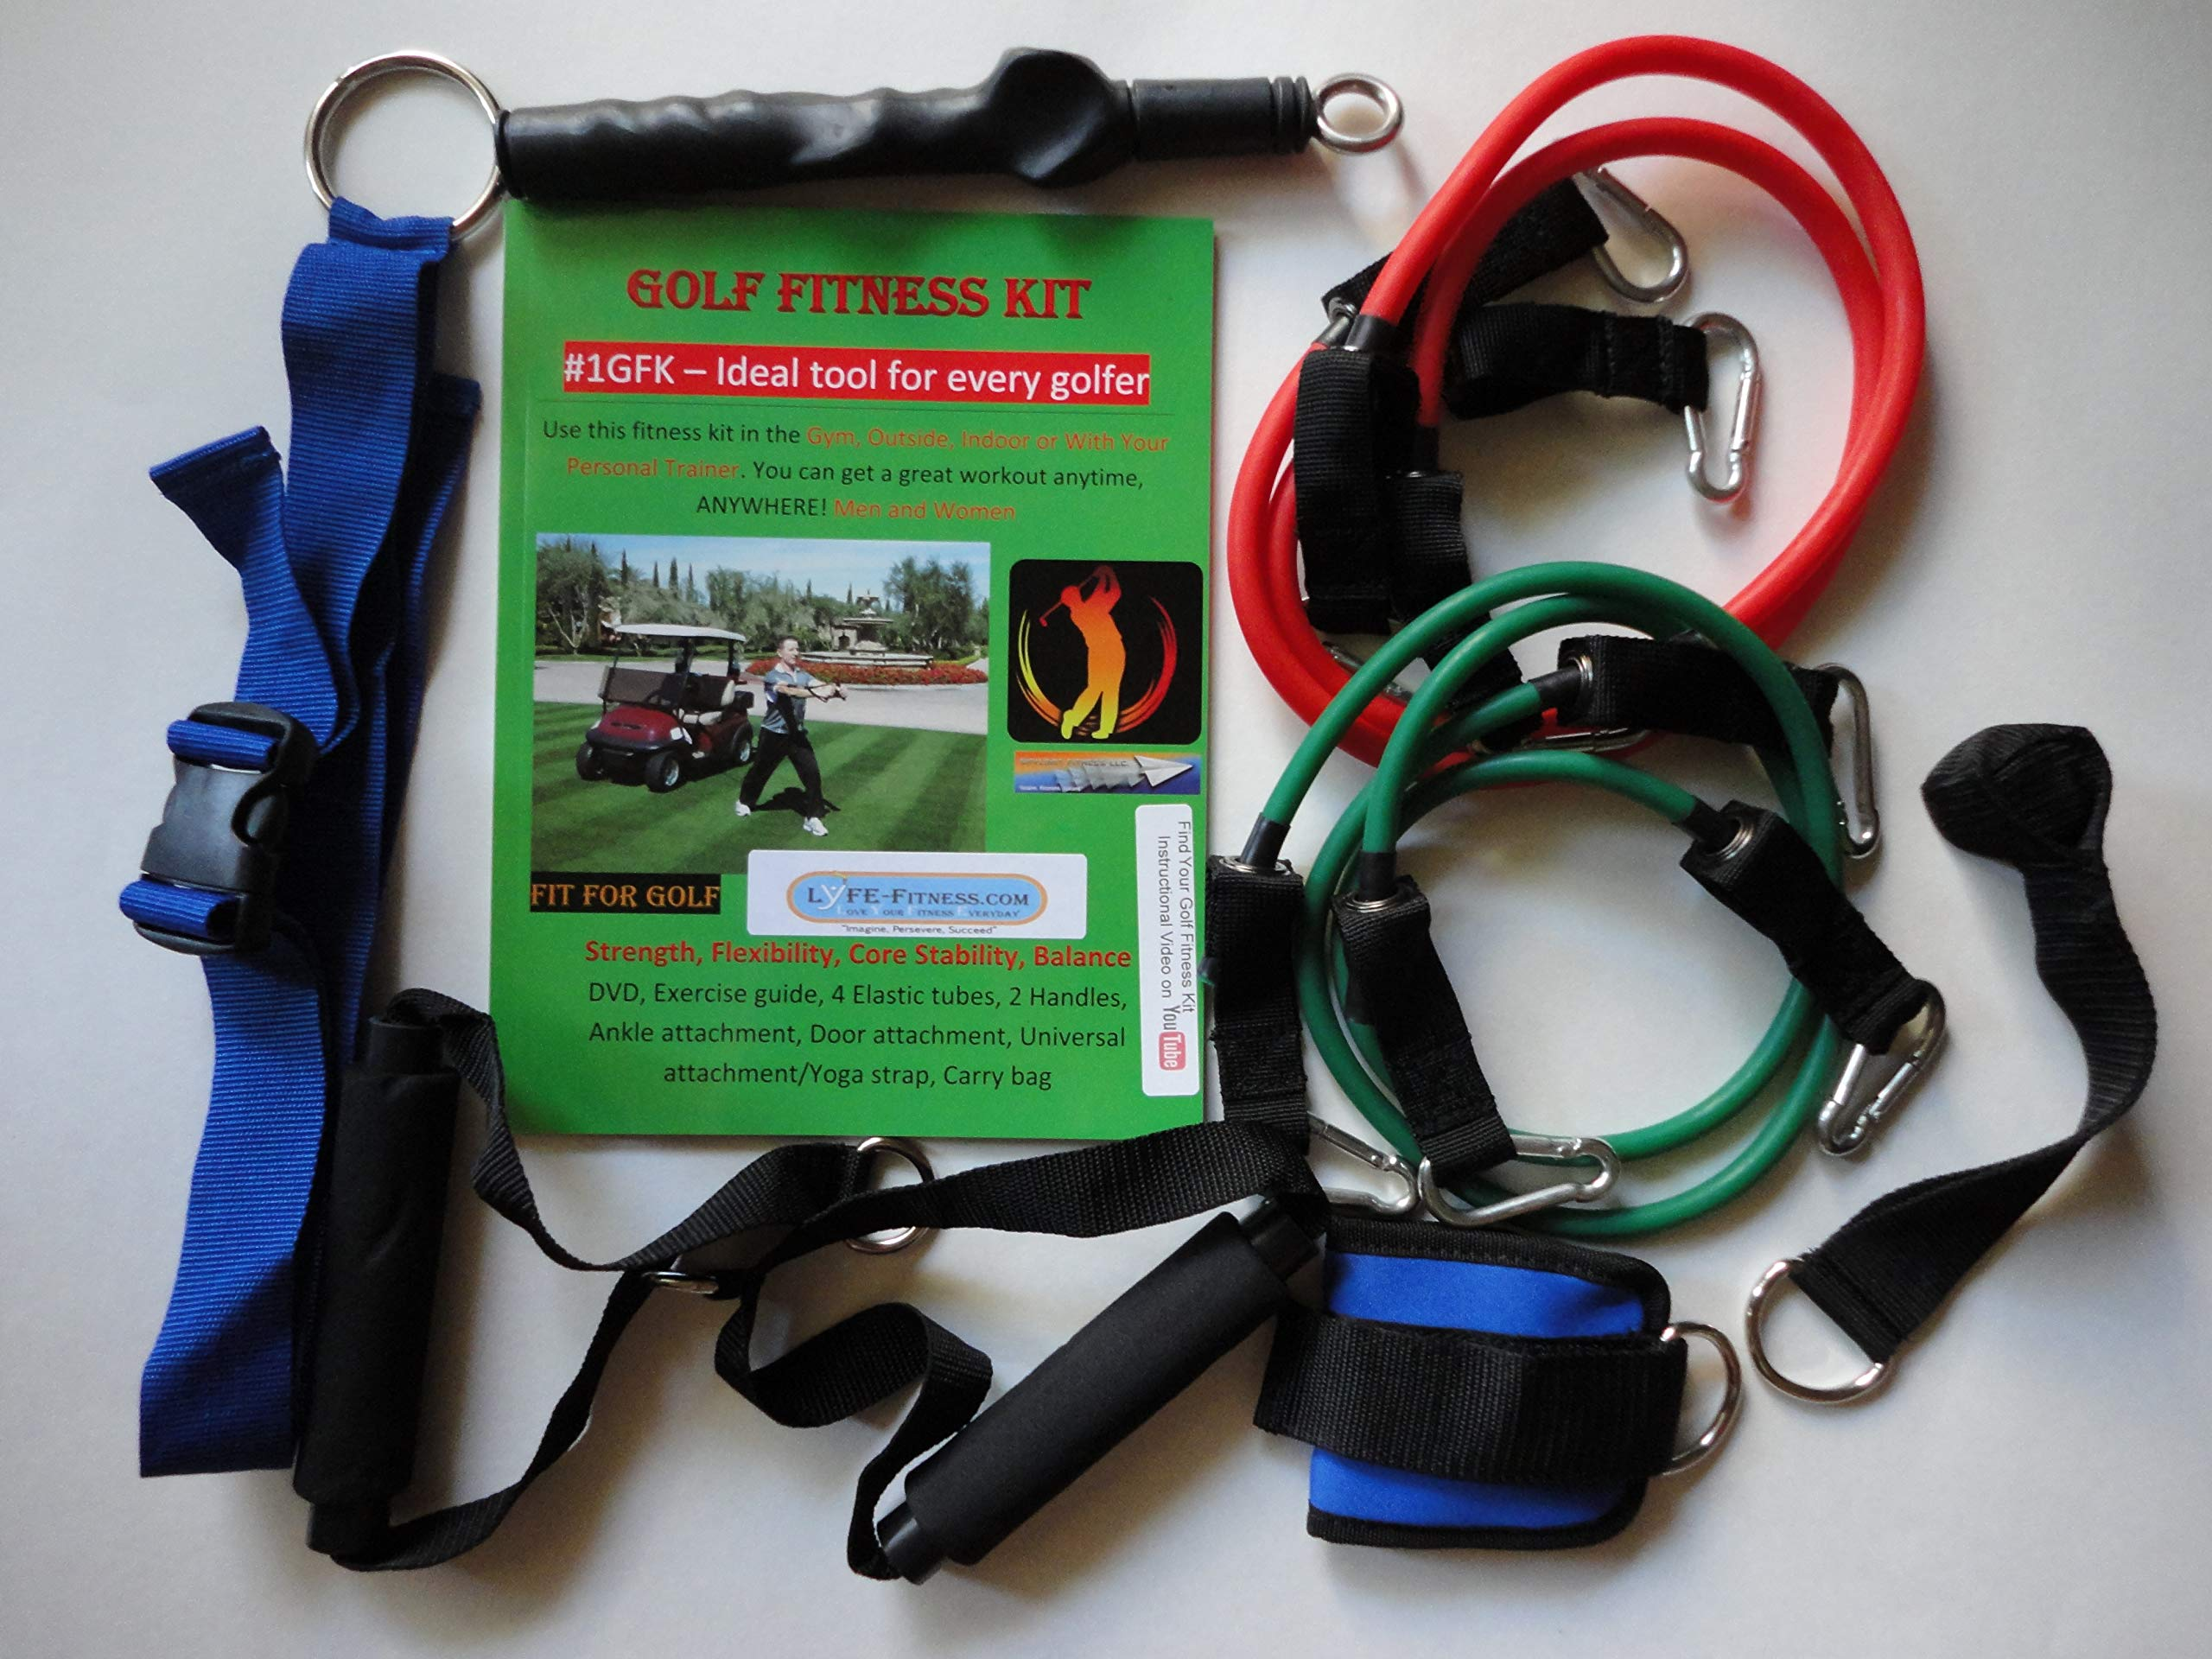 Golf Fitness Kit #1GFK